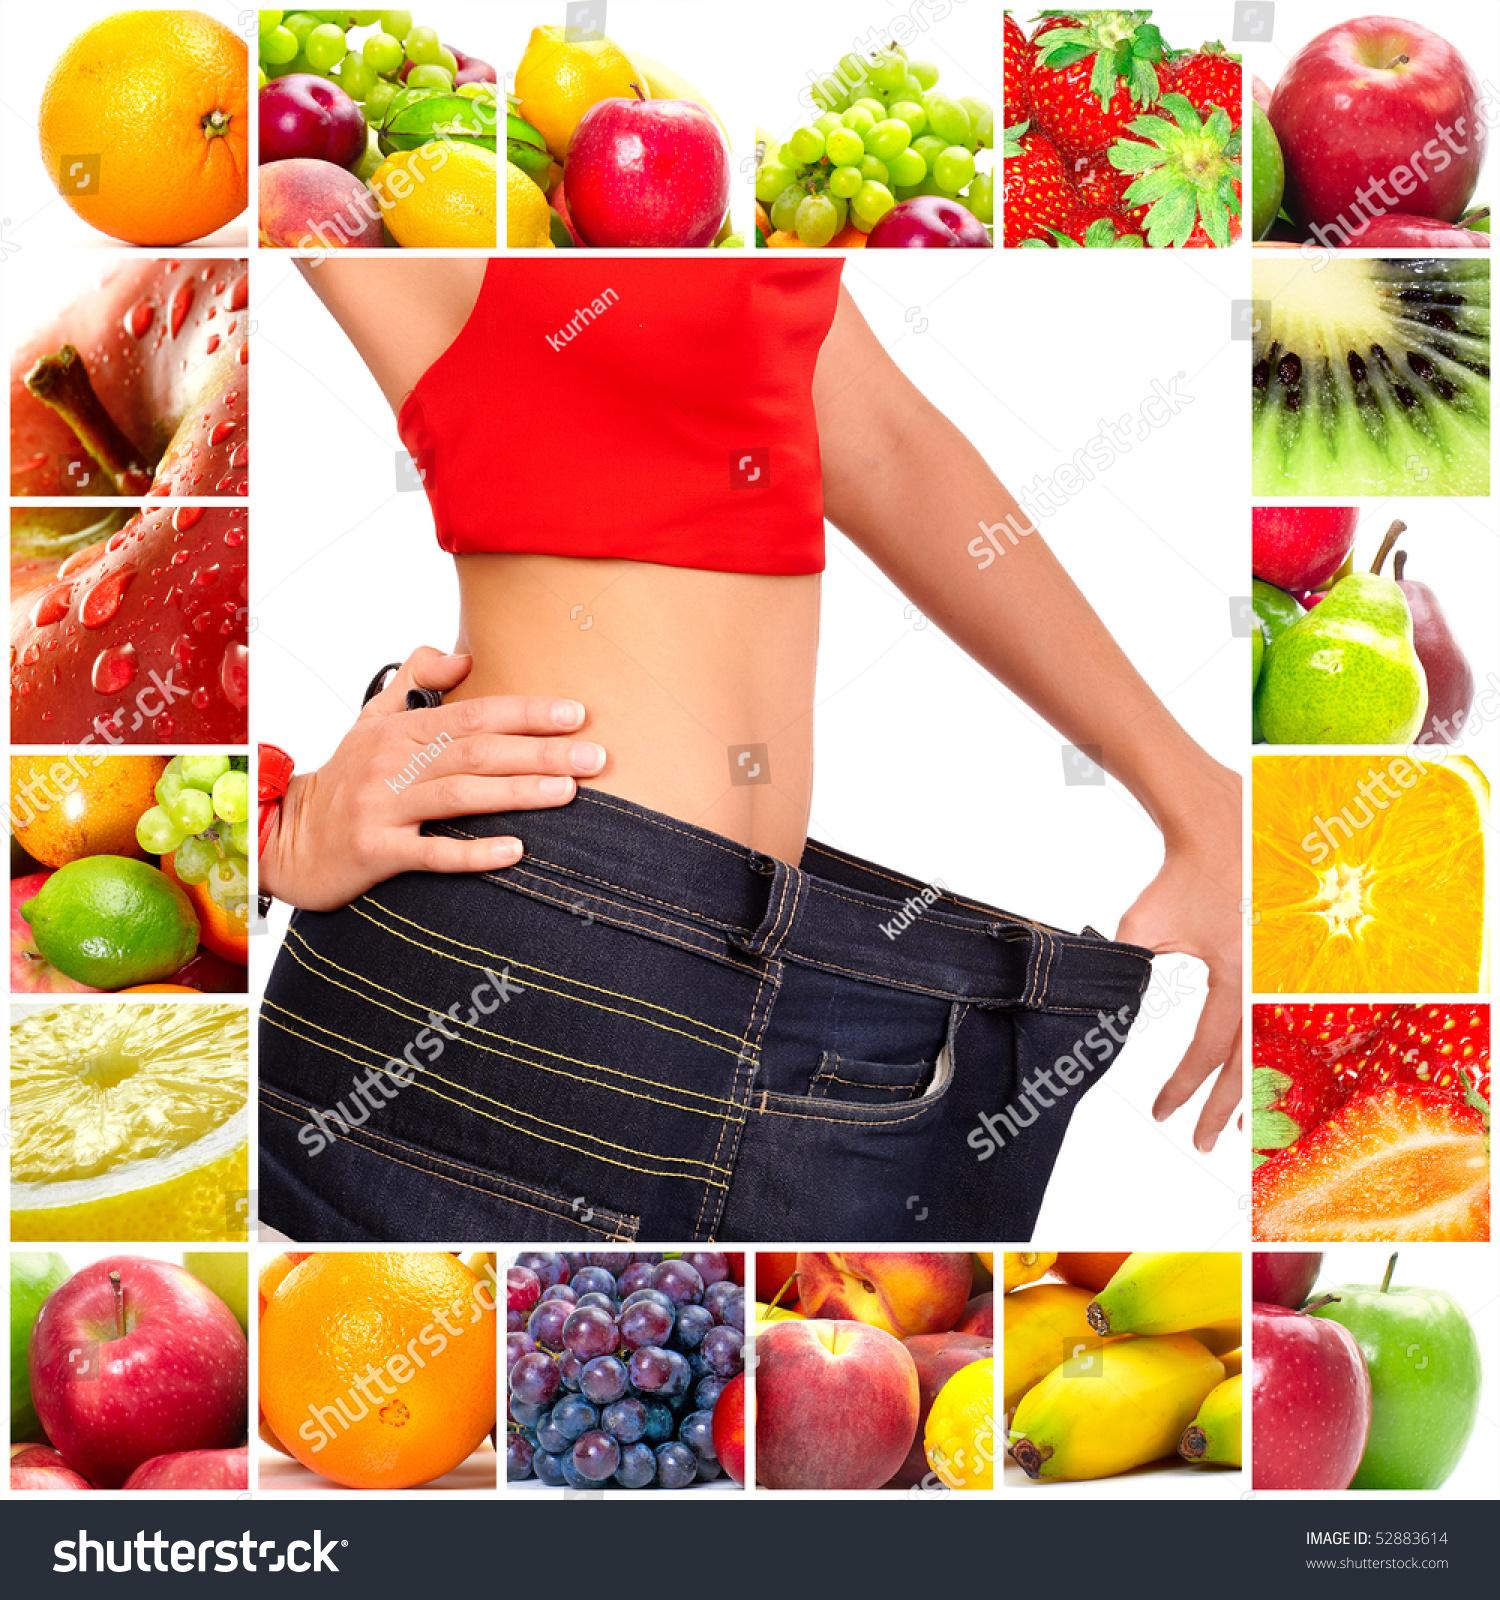 Fruit Diets: Fruit Diet. Fruits. Apple, Banana, Orange, Kiwi, Salad